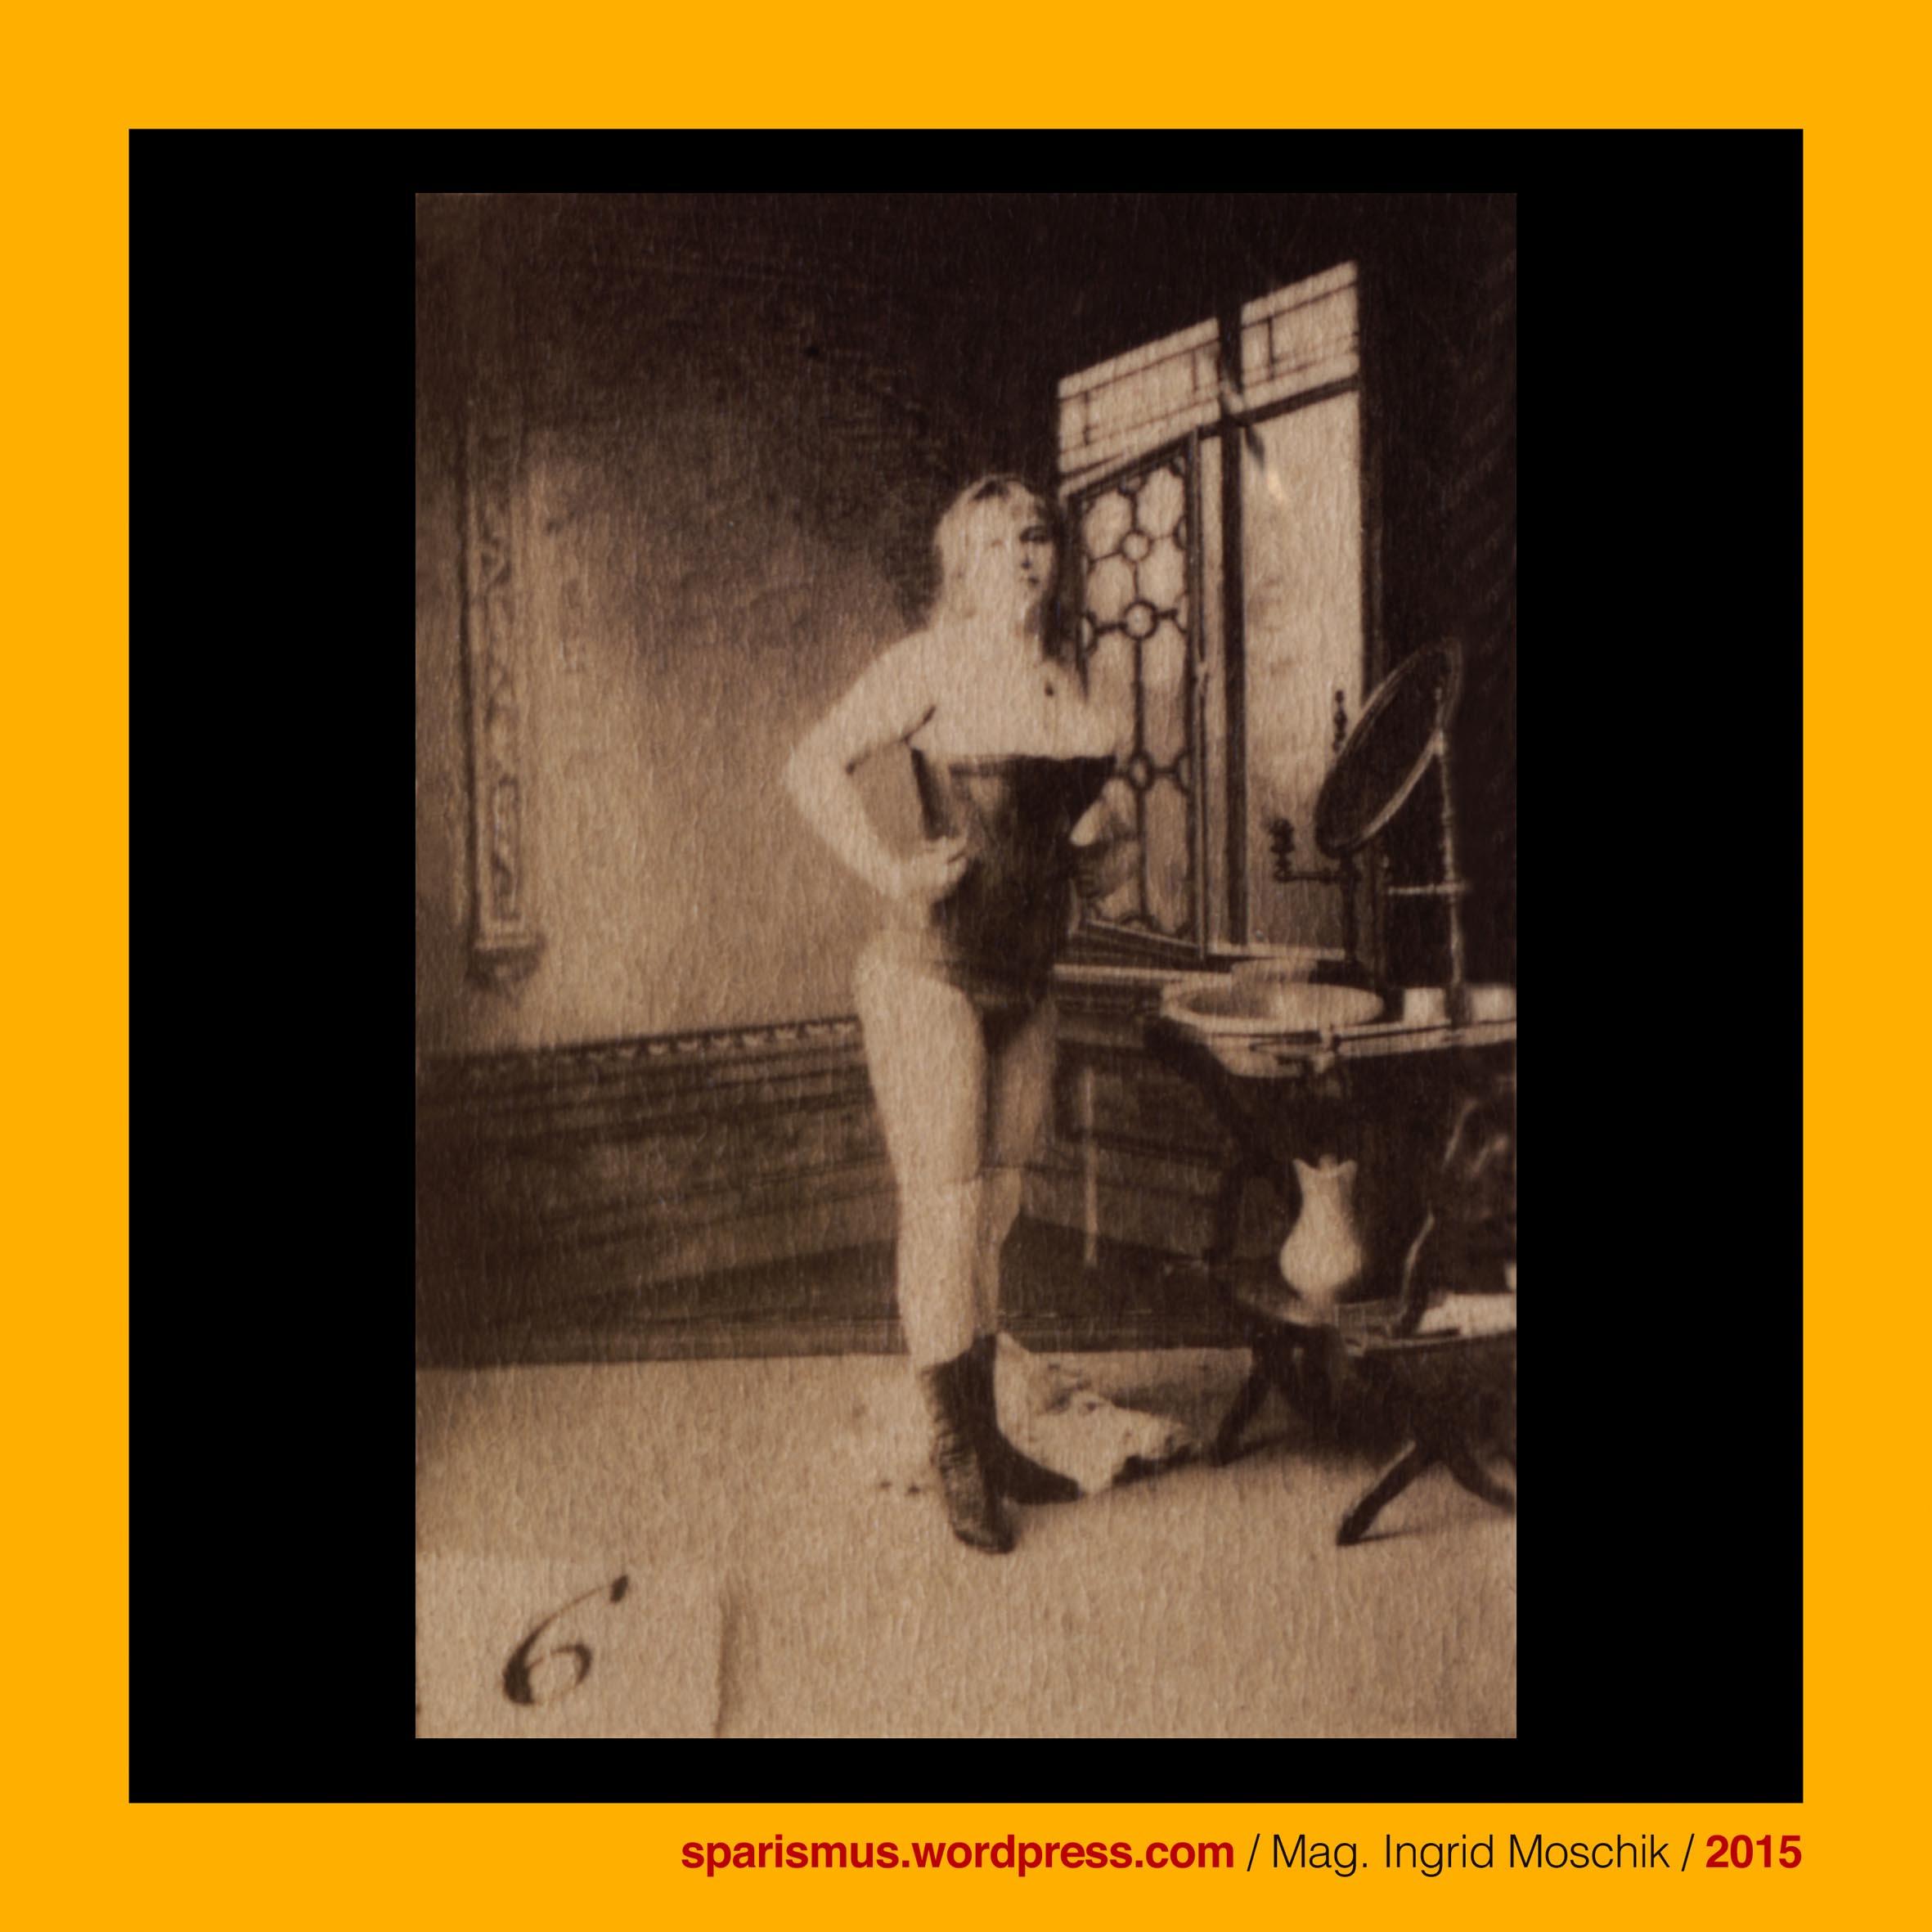 Ottoschmidtwien4281885Junge Dame Weissem Ottoschmidtwien4281885Junge Coutil Dame In T3uF1cK5lJ